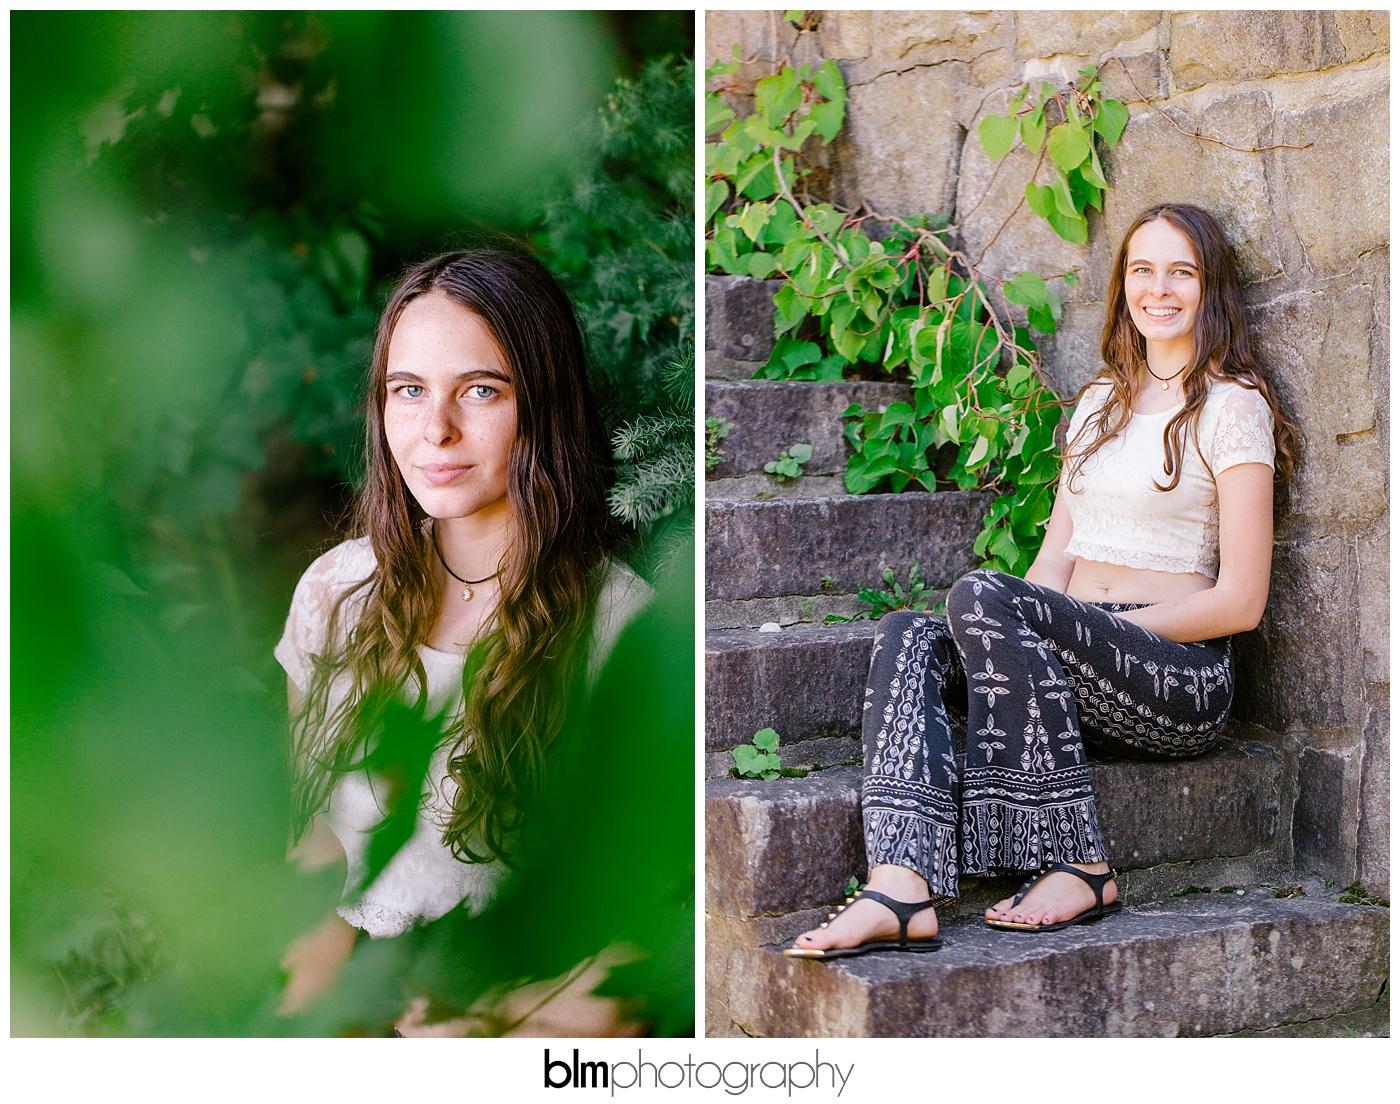 Carly-Cresta_Senior-Portraits_091516-2852.jpg